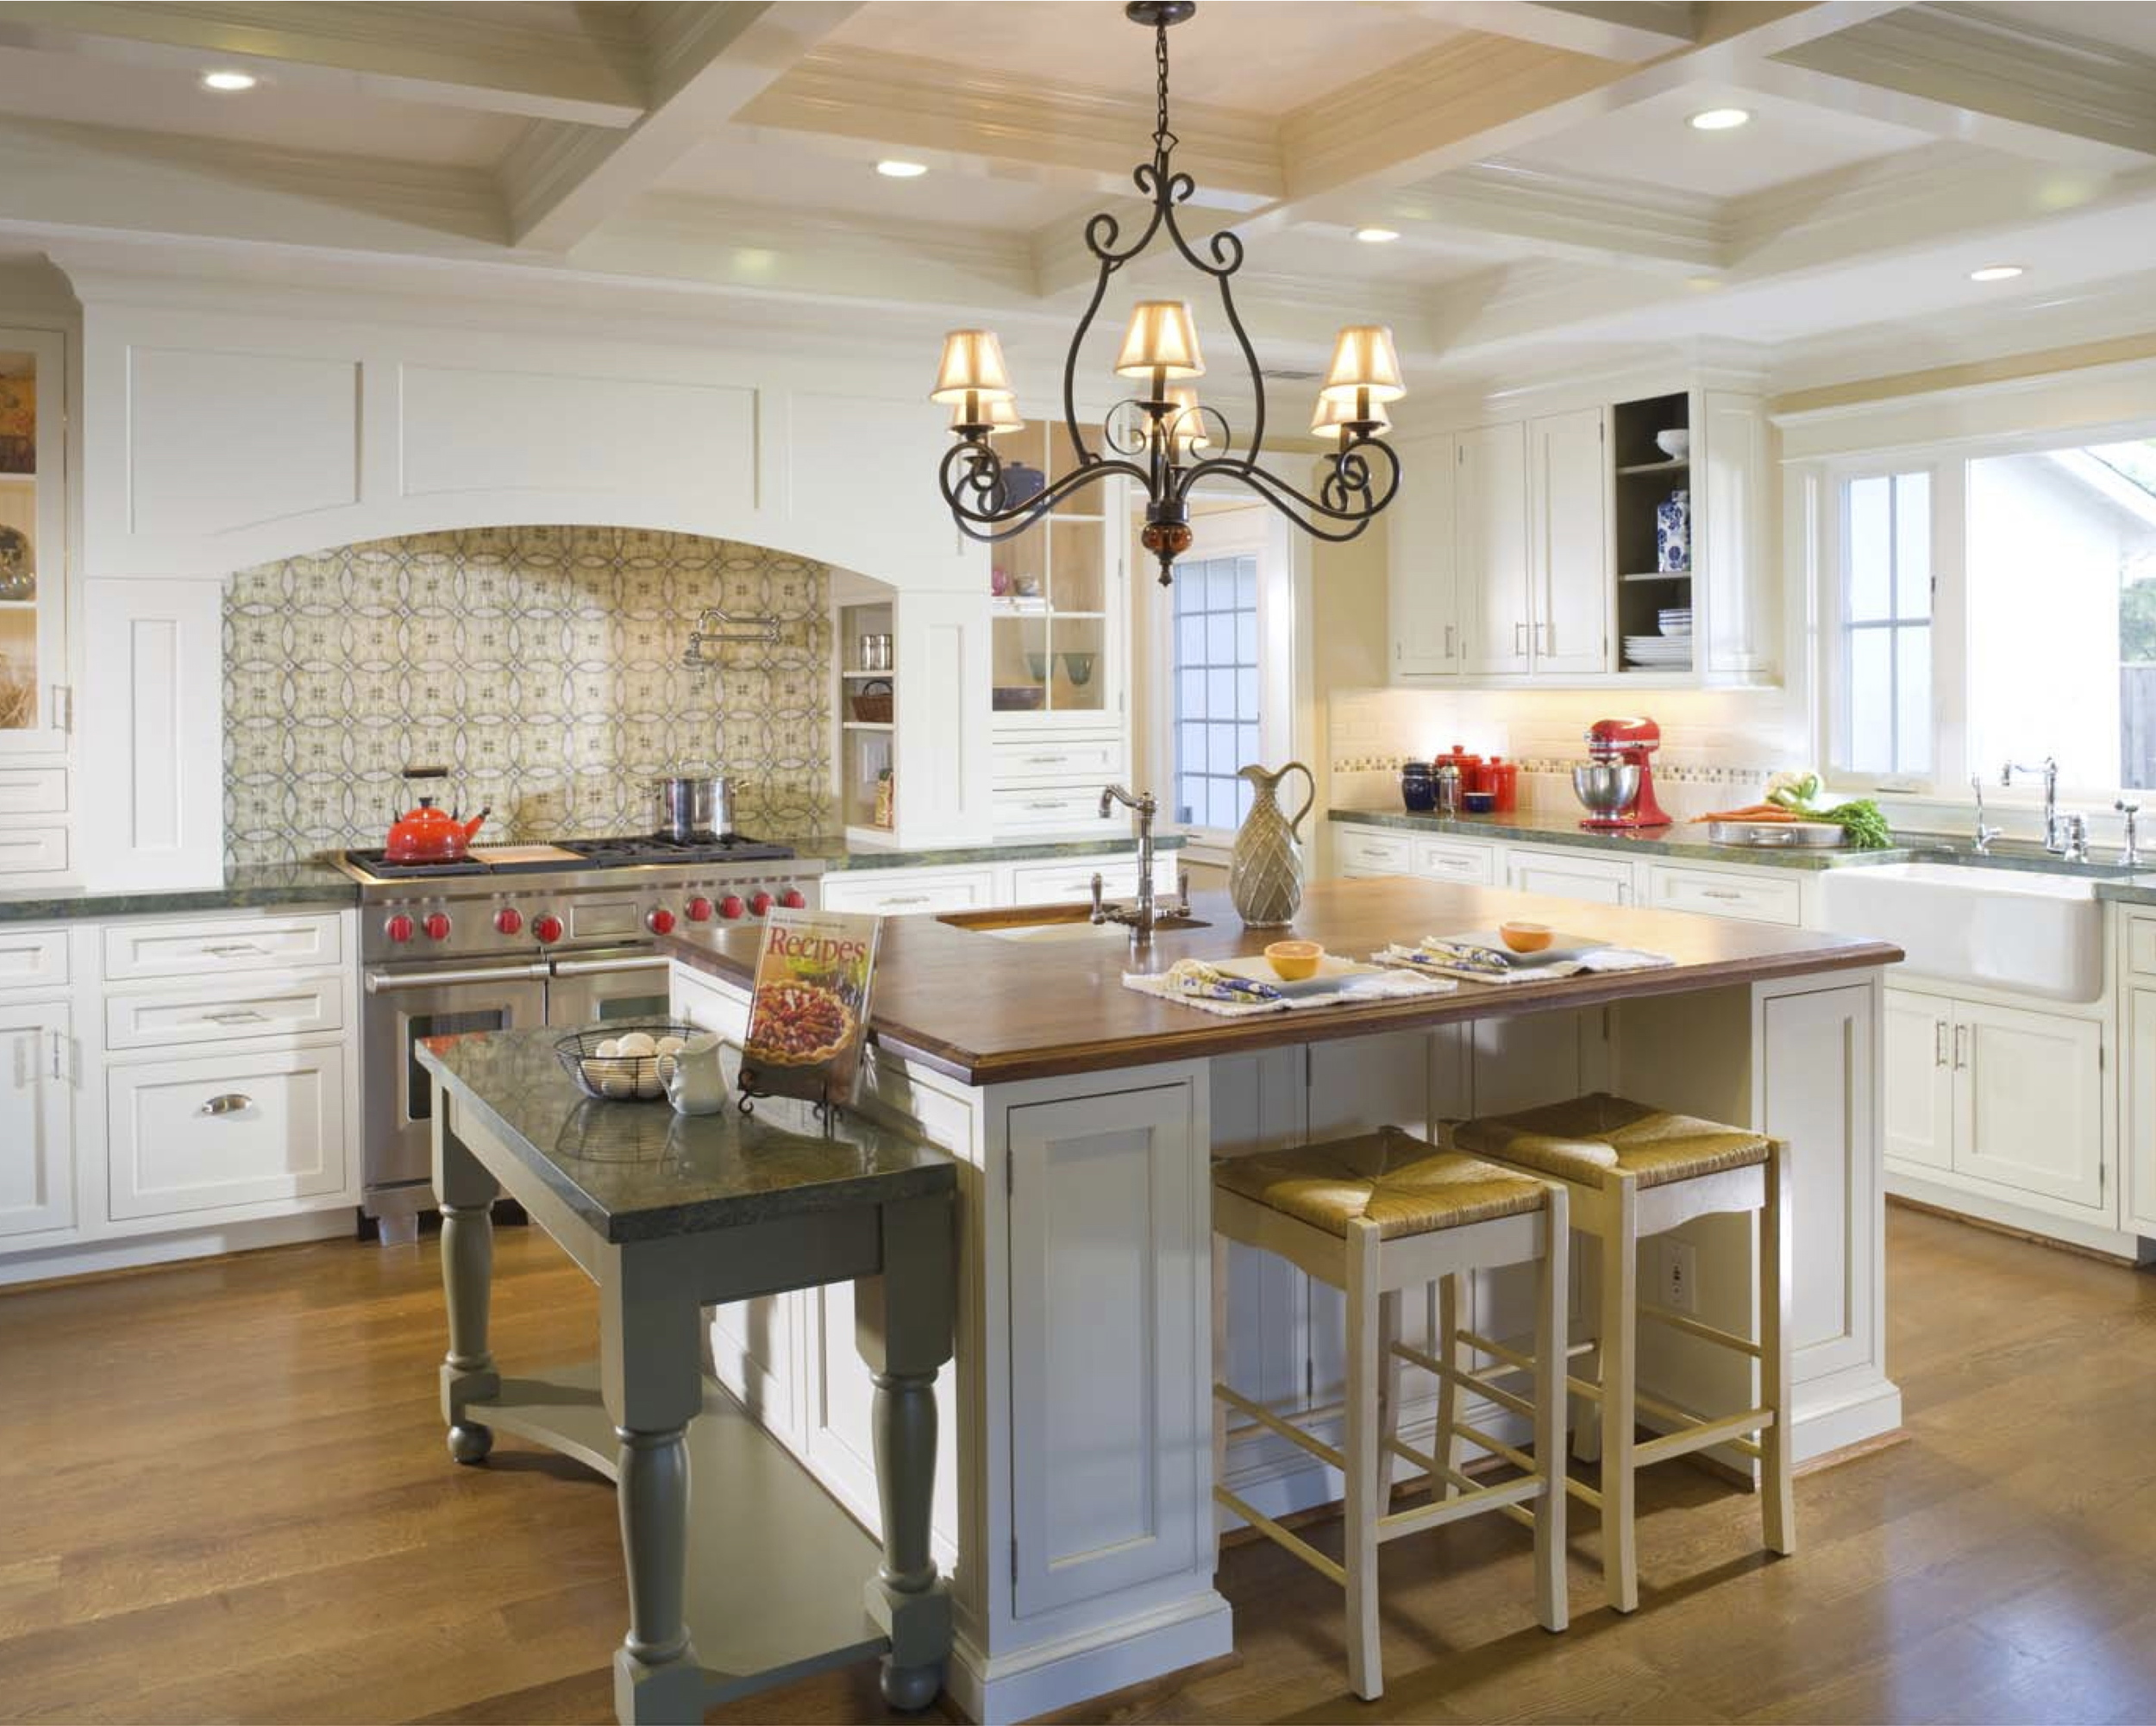 Kitchen in Saratoga, CA